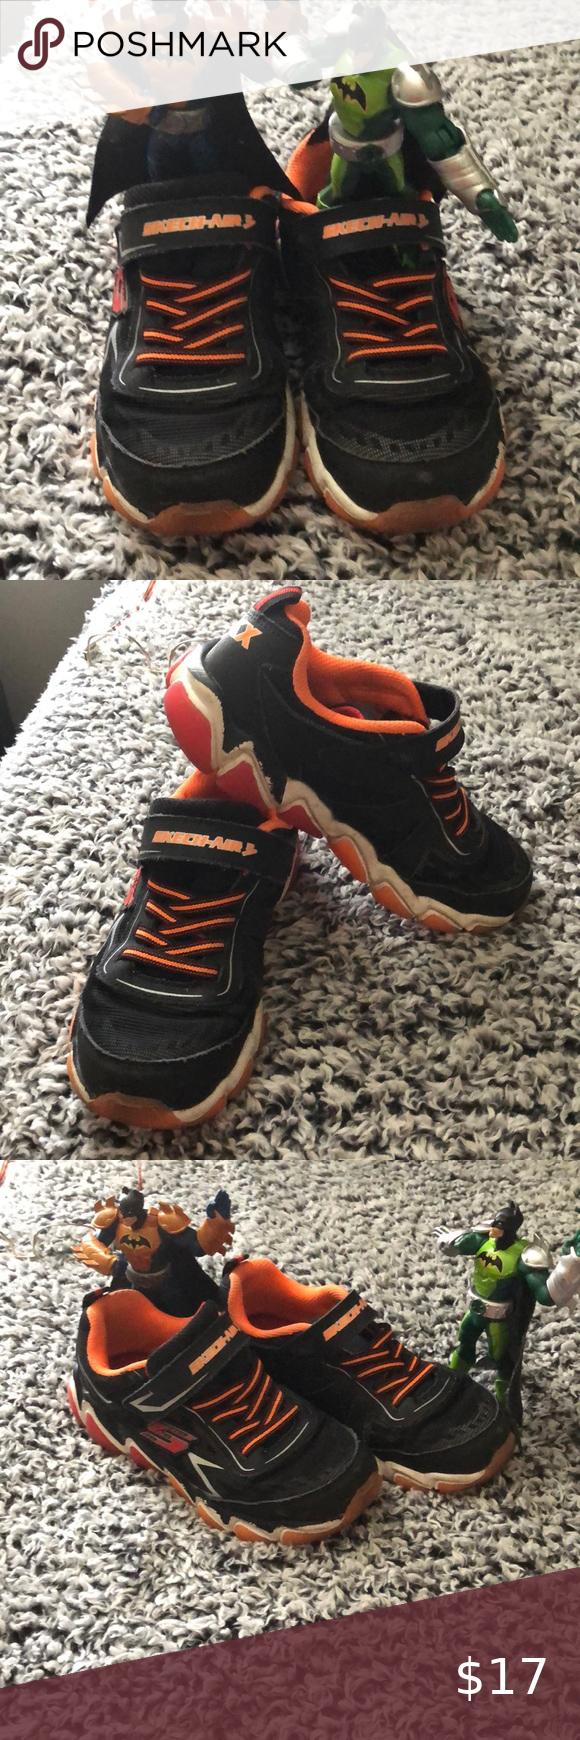 skx tennis shoes